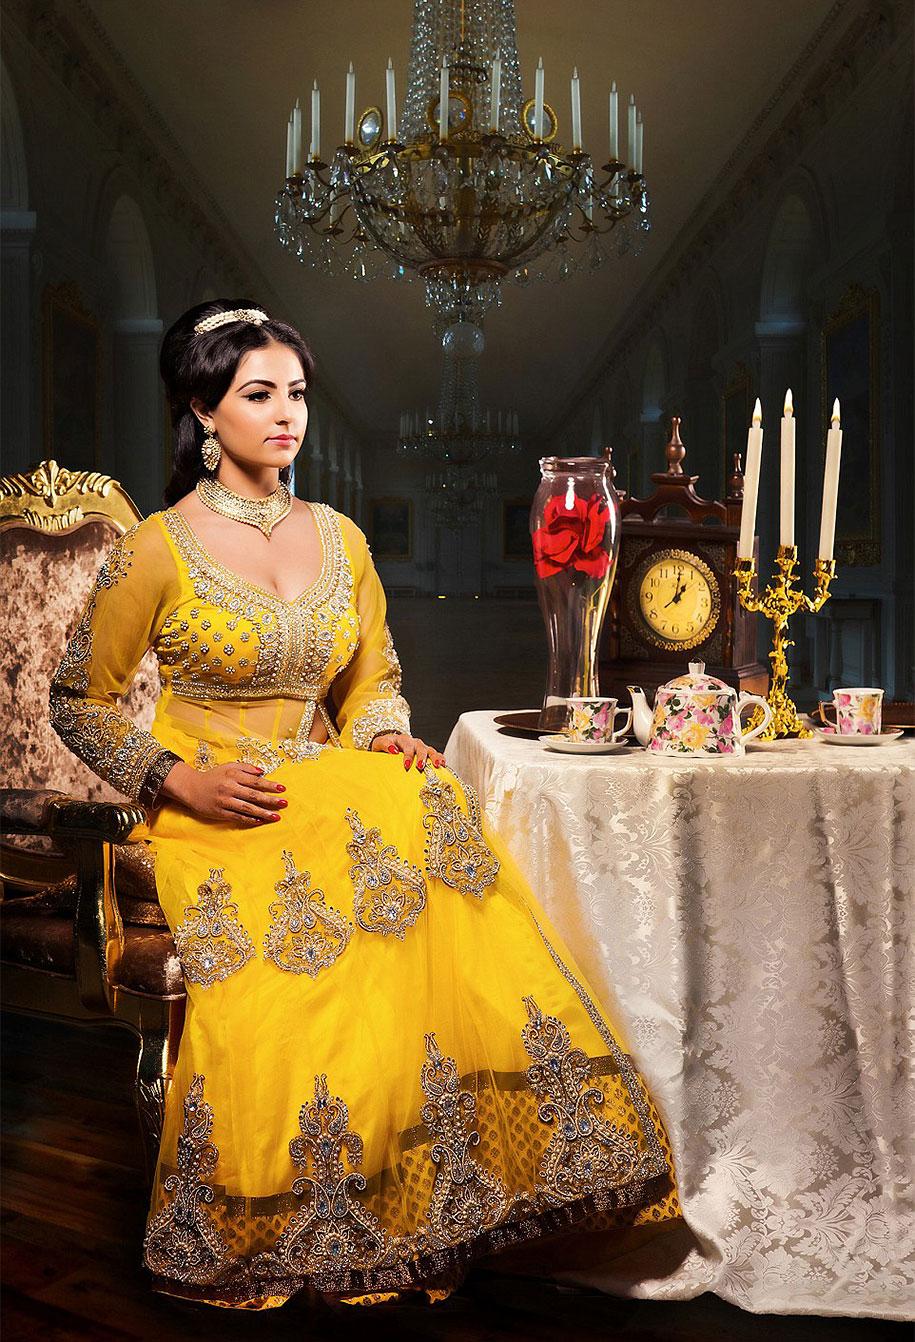 disney-princess-bride-india-wedding-photography-amrit-grewal-9